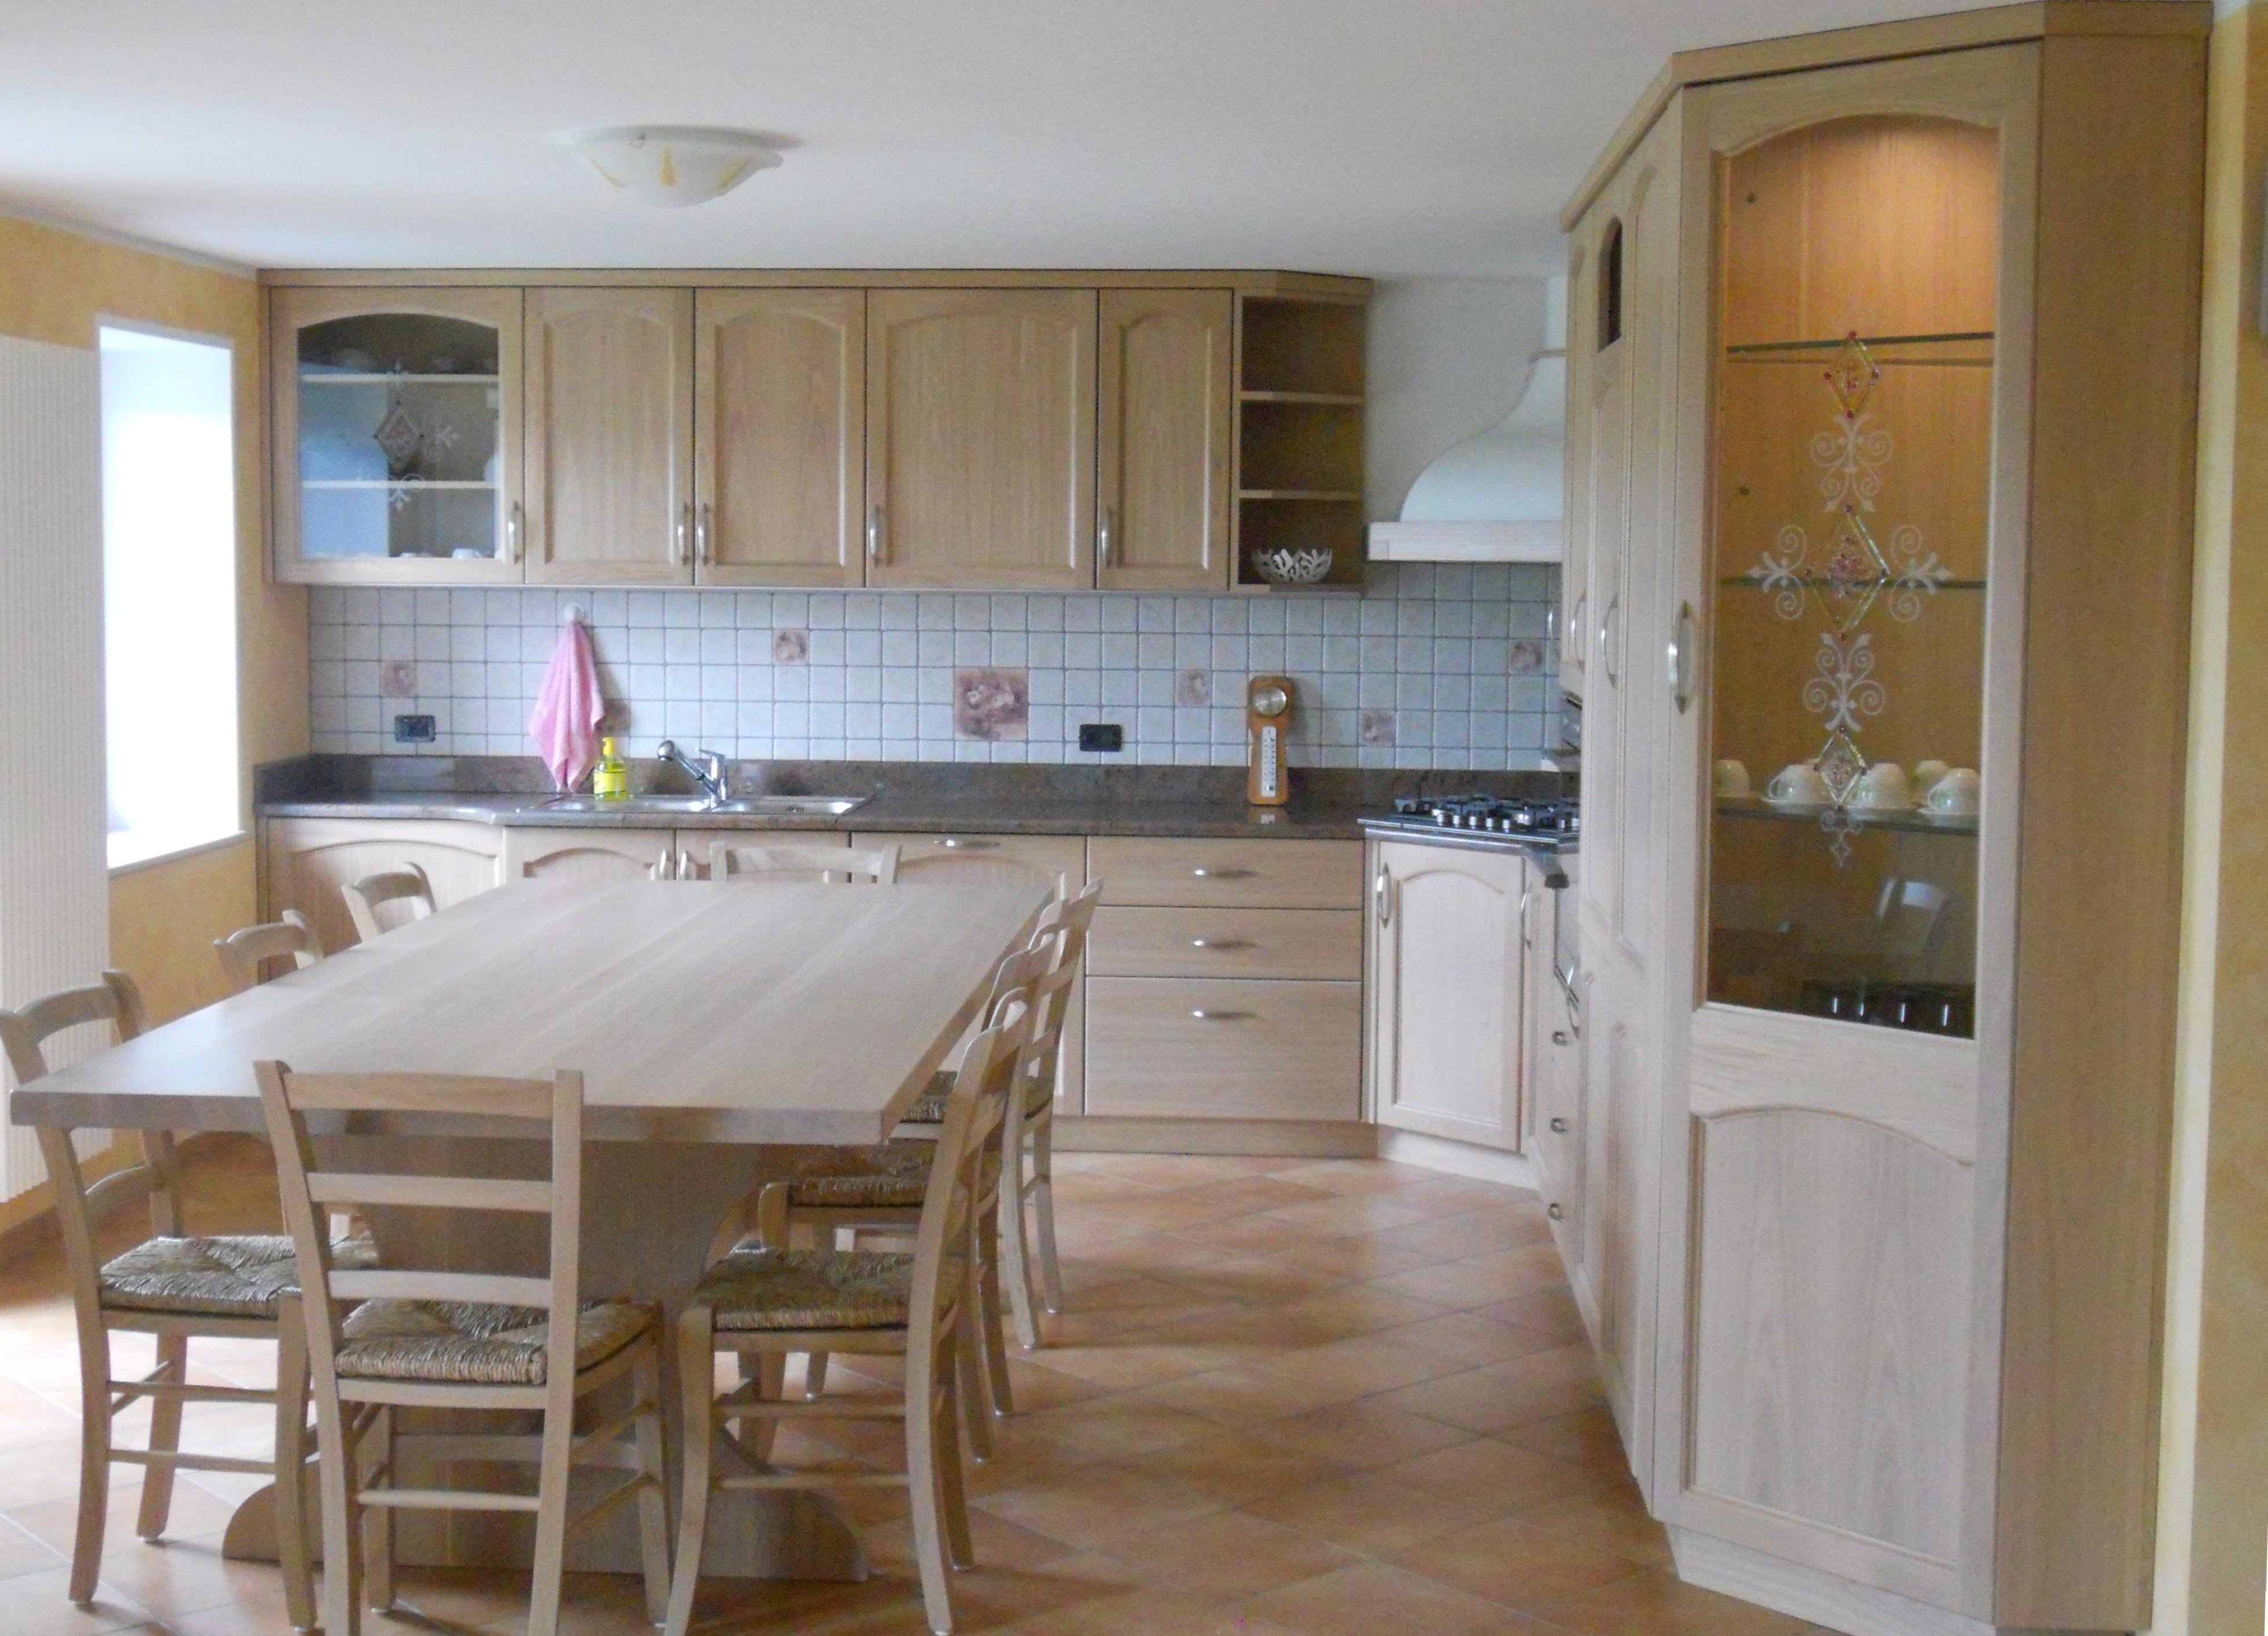 Cucina 15 - Cucina moderna in stile minimalista realizzabile ...